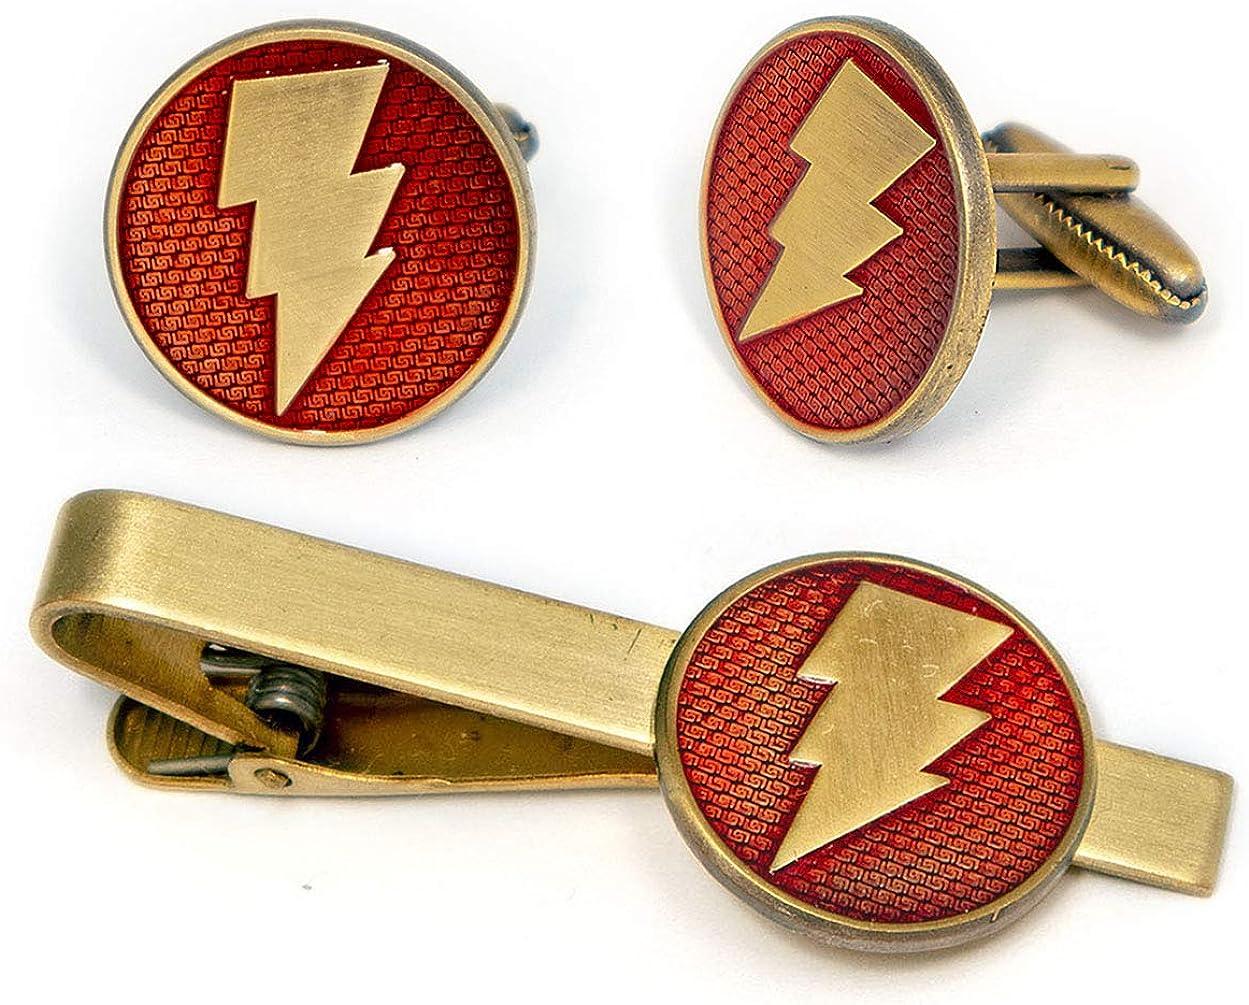 Shazam Cufflinks, Captain Marvel Tie Clip, DC Comics Batman vs Superman Tie Tack Jewelry, Nightwing Cuff Links Link Wedding Party Gift, Justice League Avengers Groomsmen Gifts